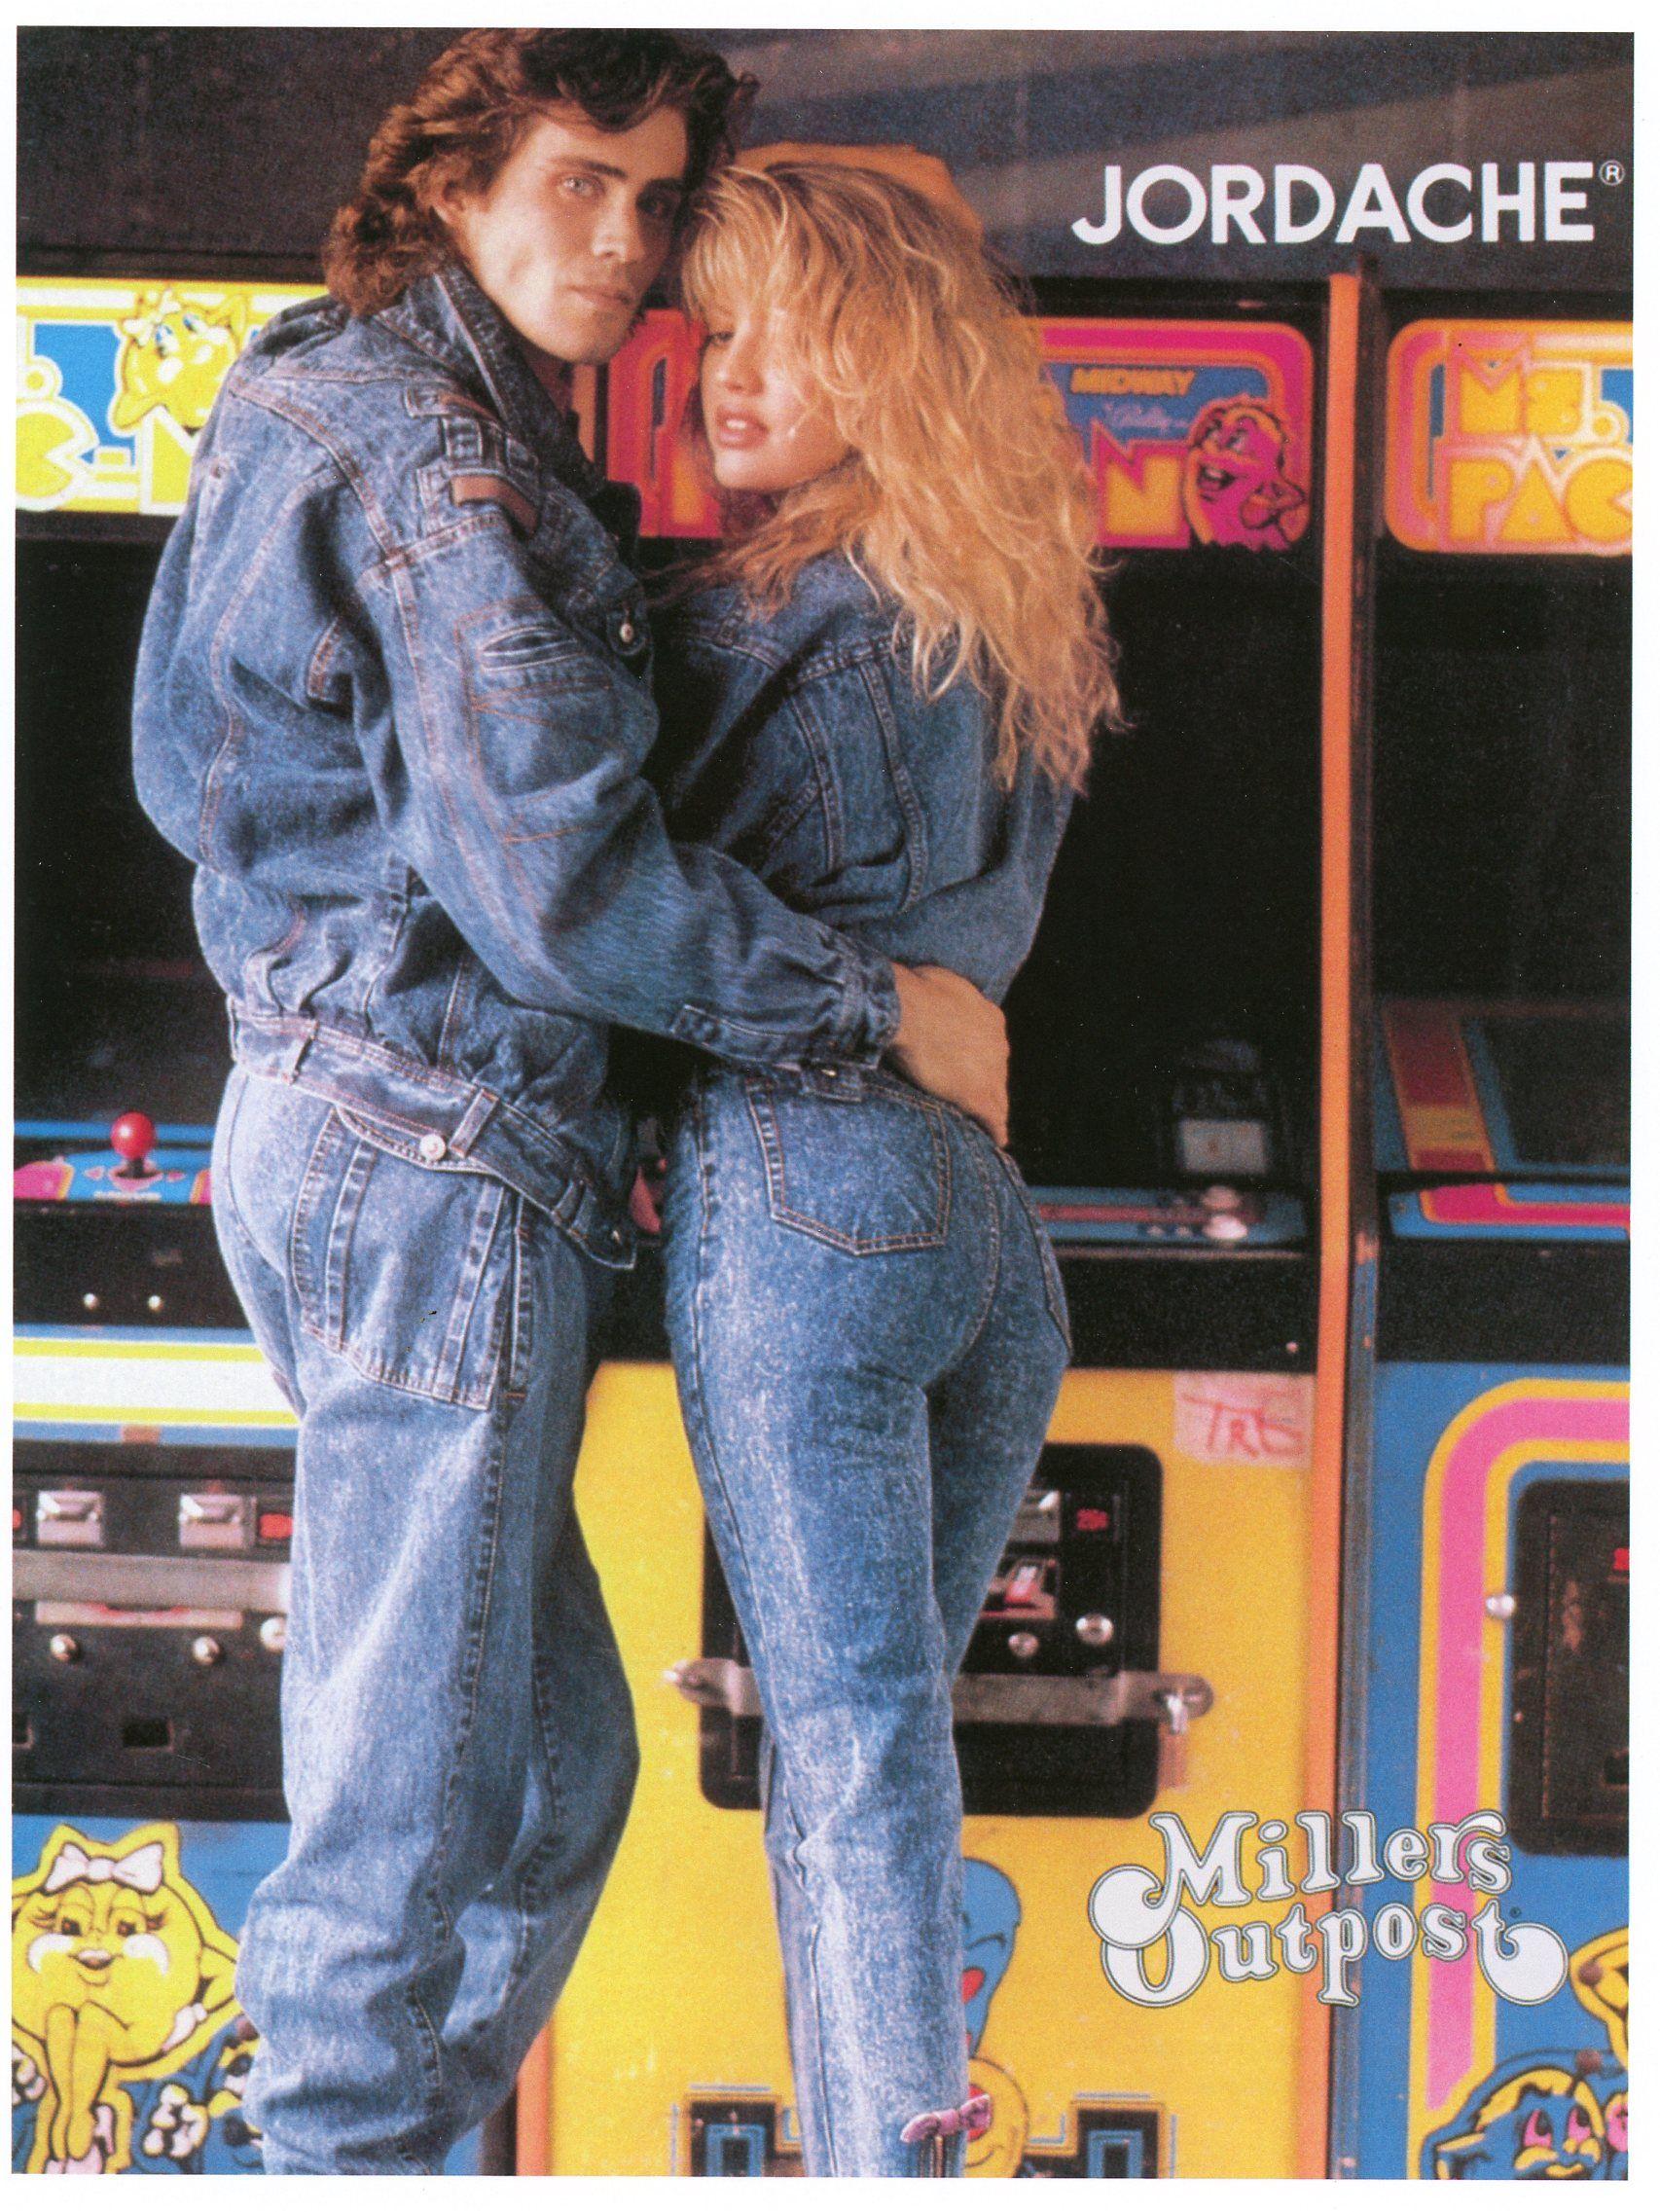 96fda60657 1988 Jordache Jeans Ad